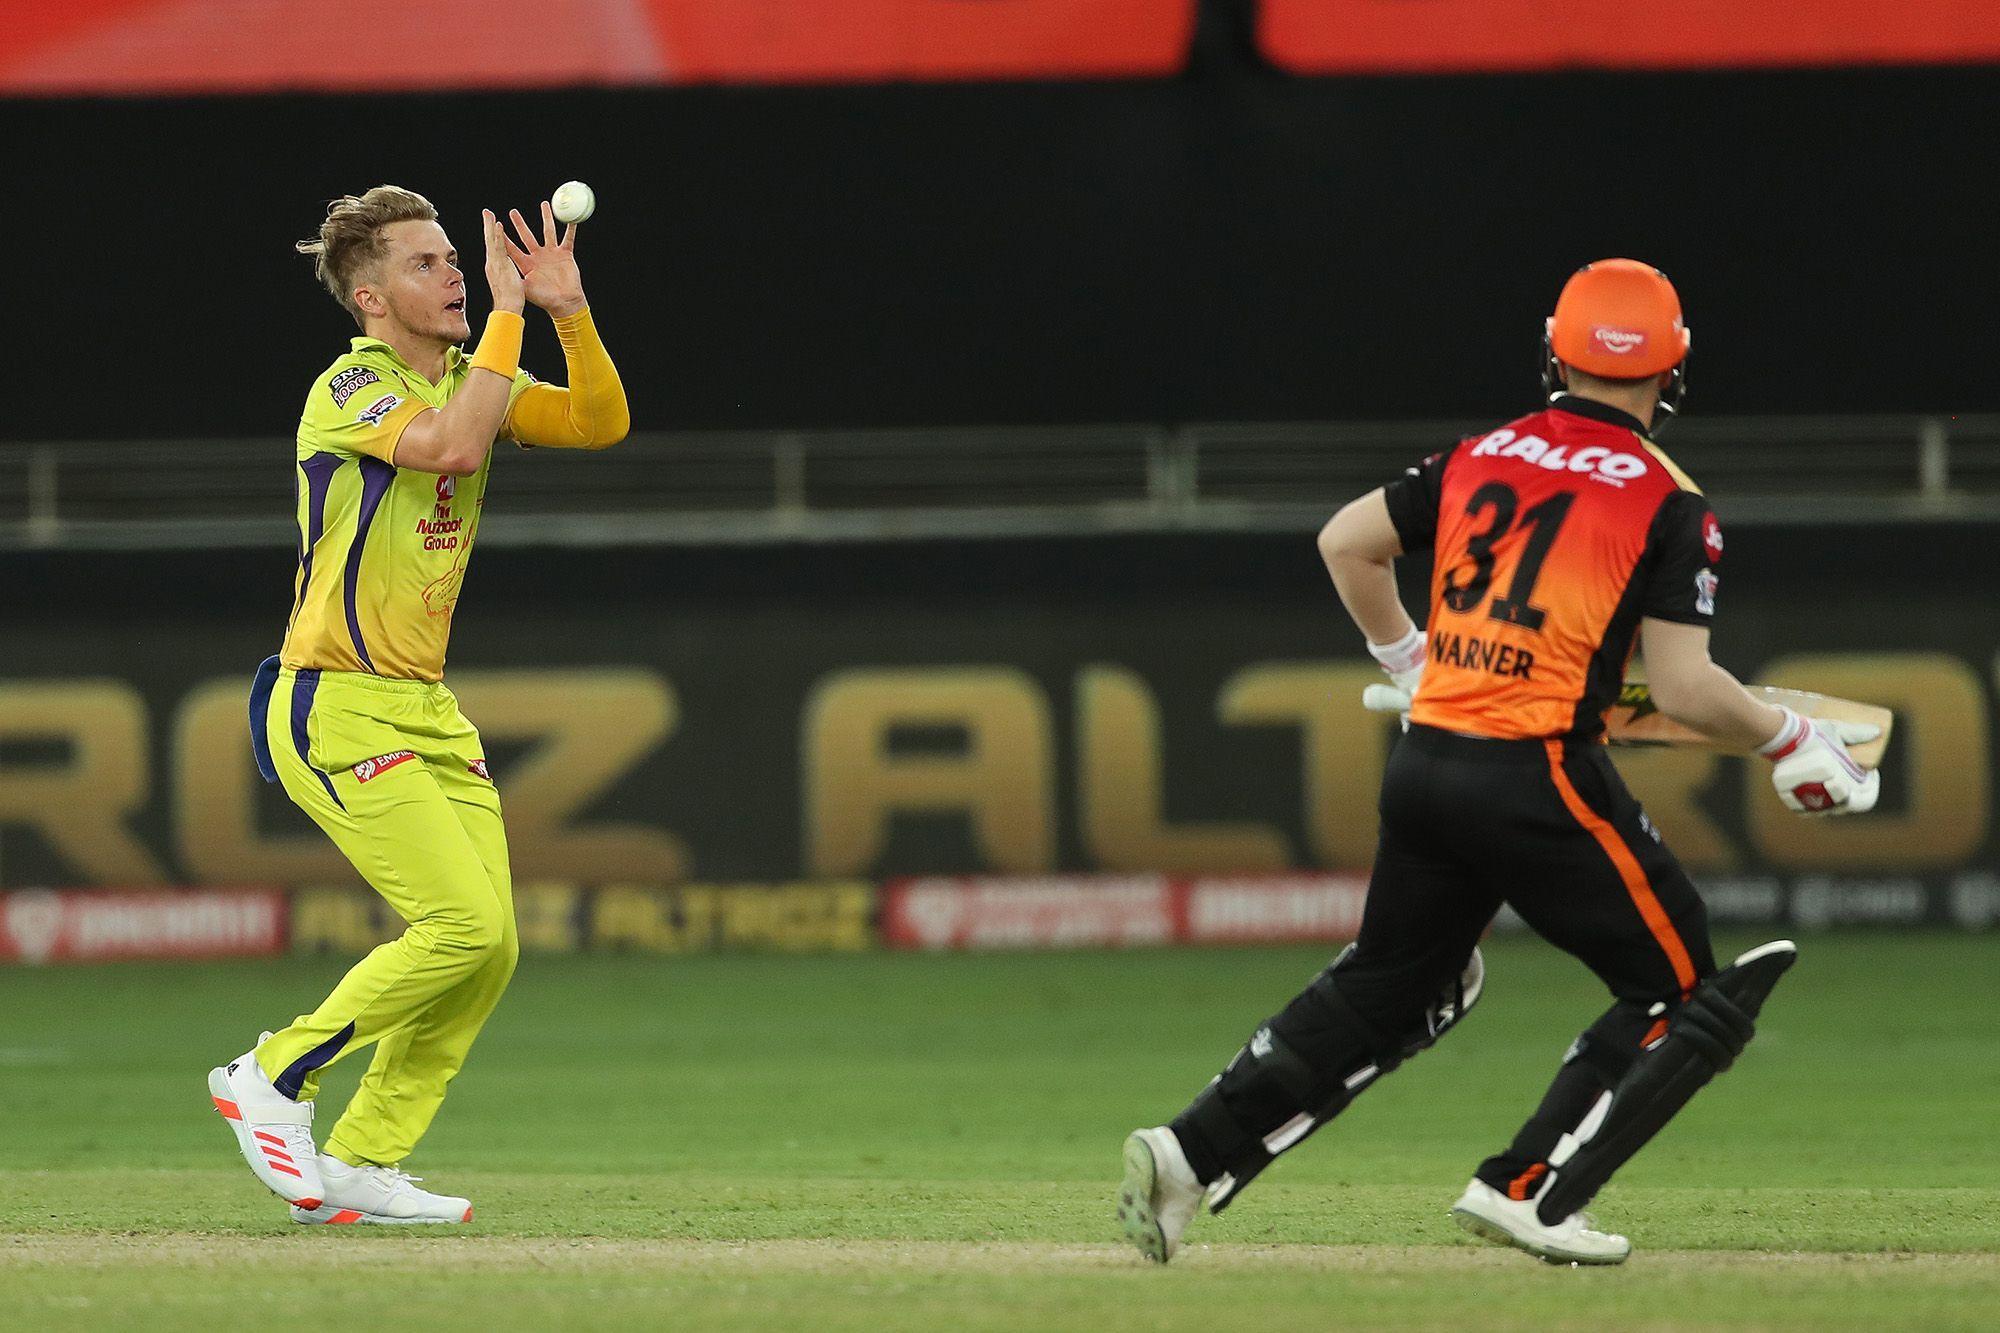 Sam Curran dismissing David Warner | BCCI/IPL